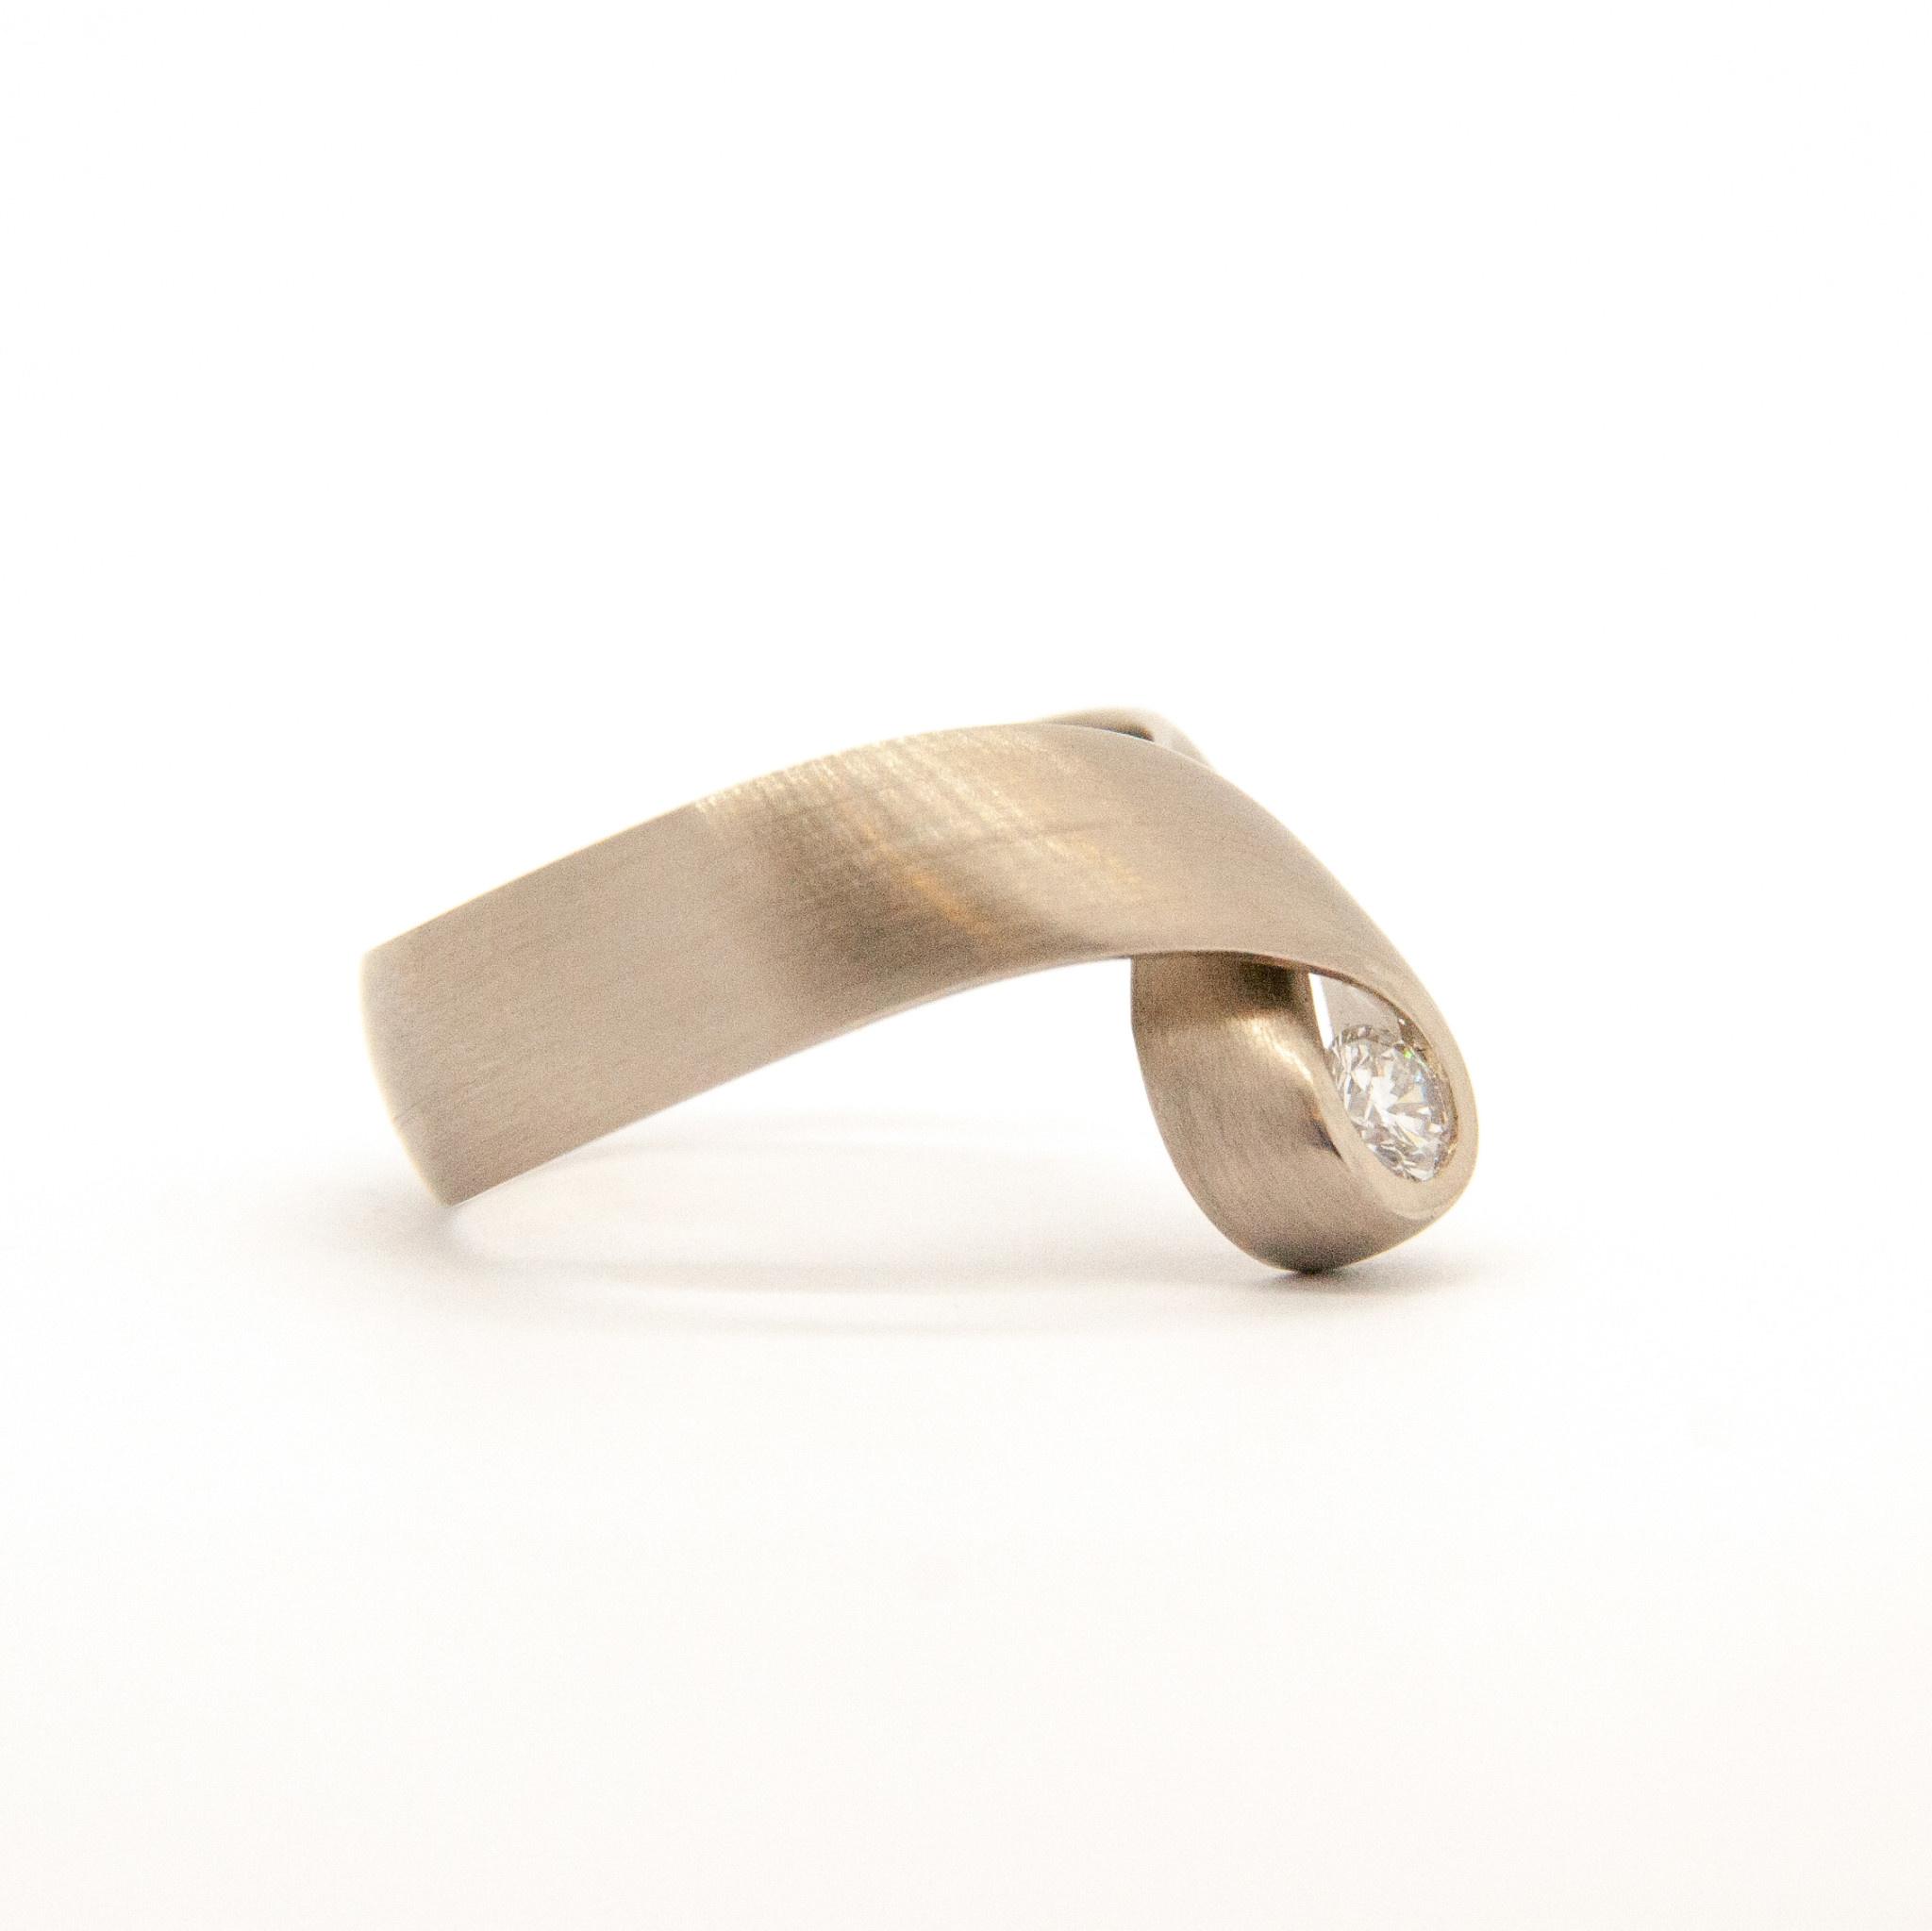 14k white gold ring size 56-3